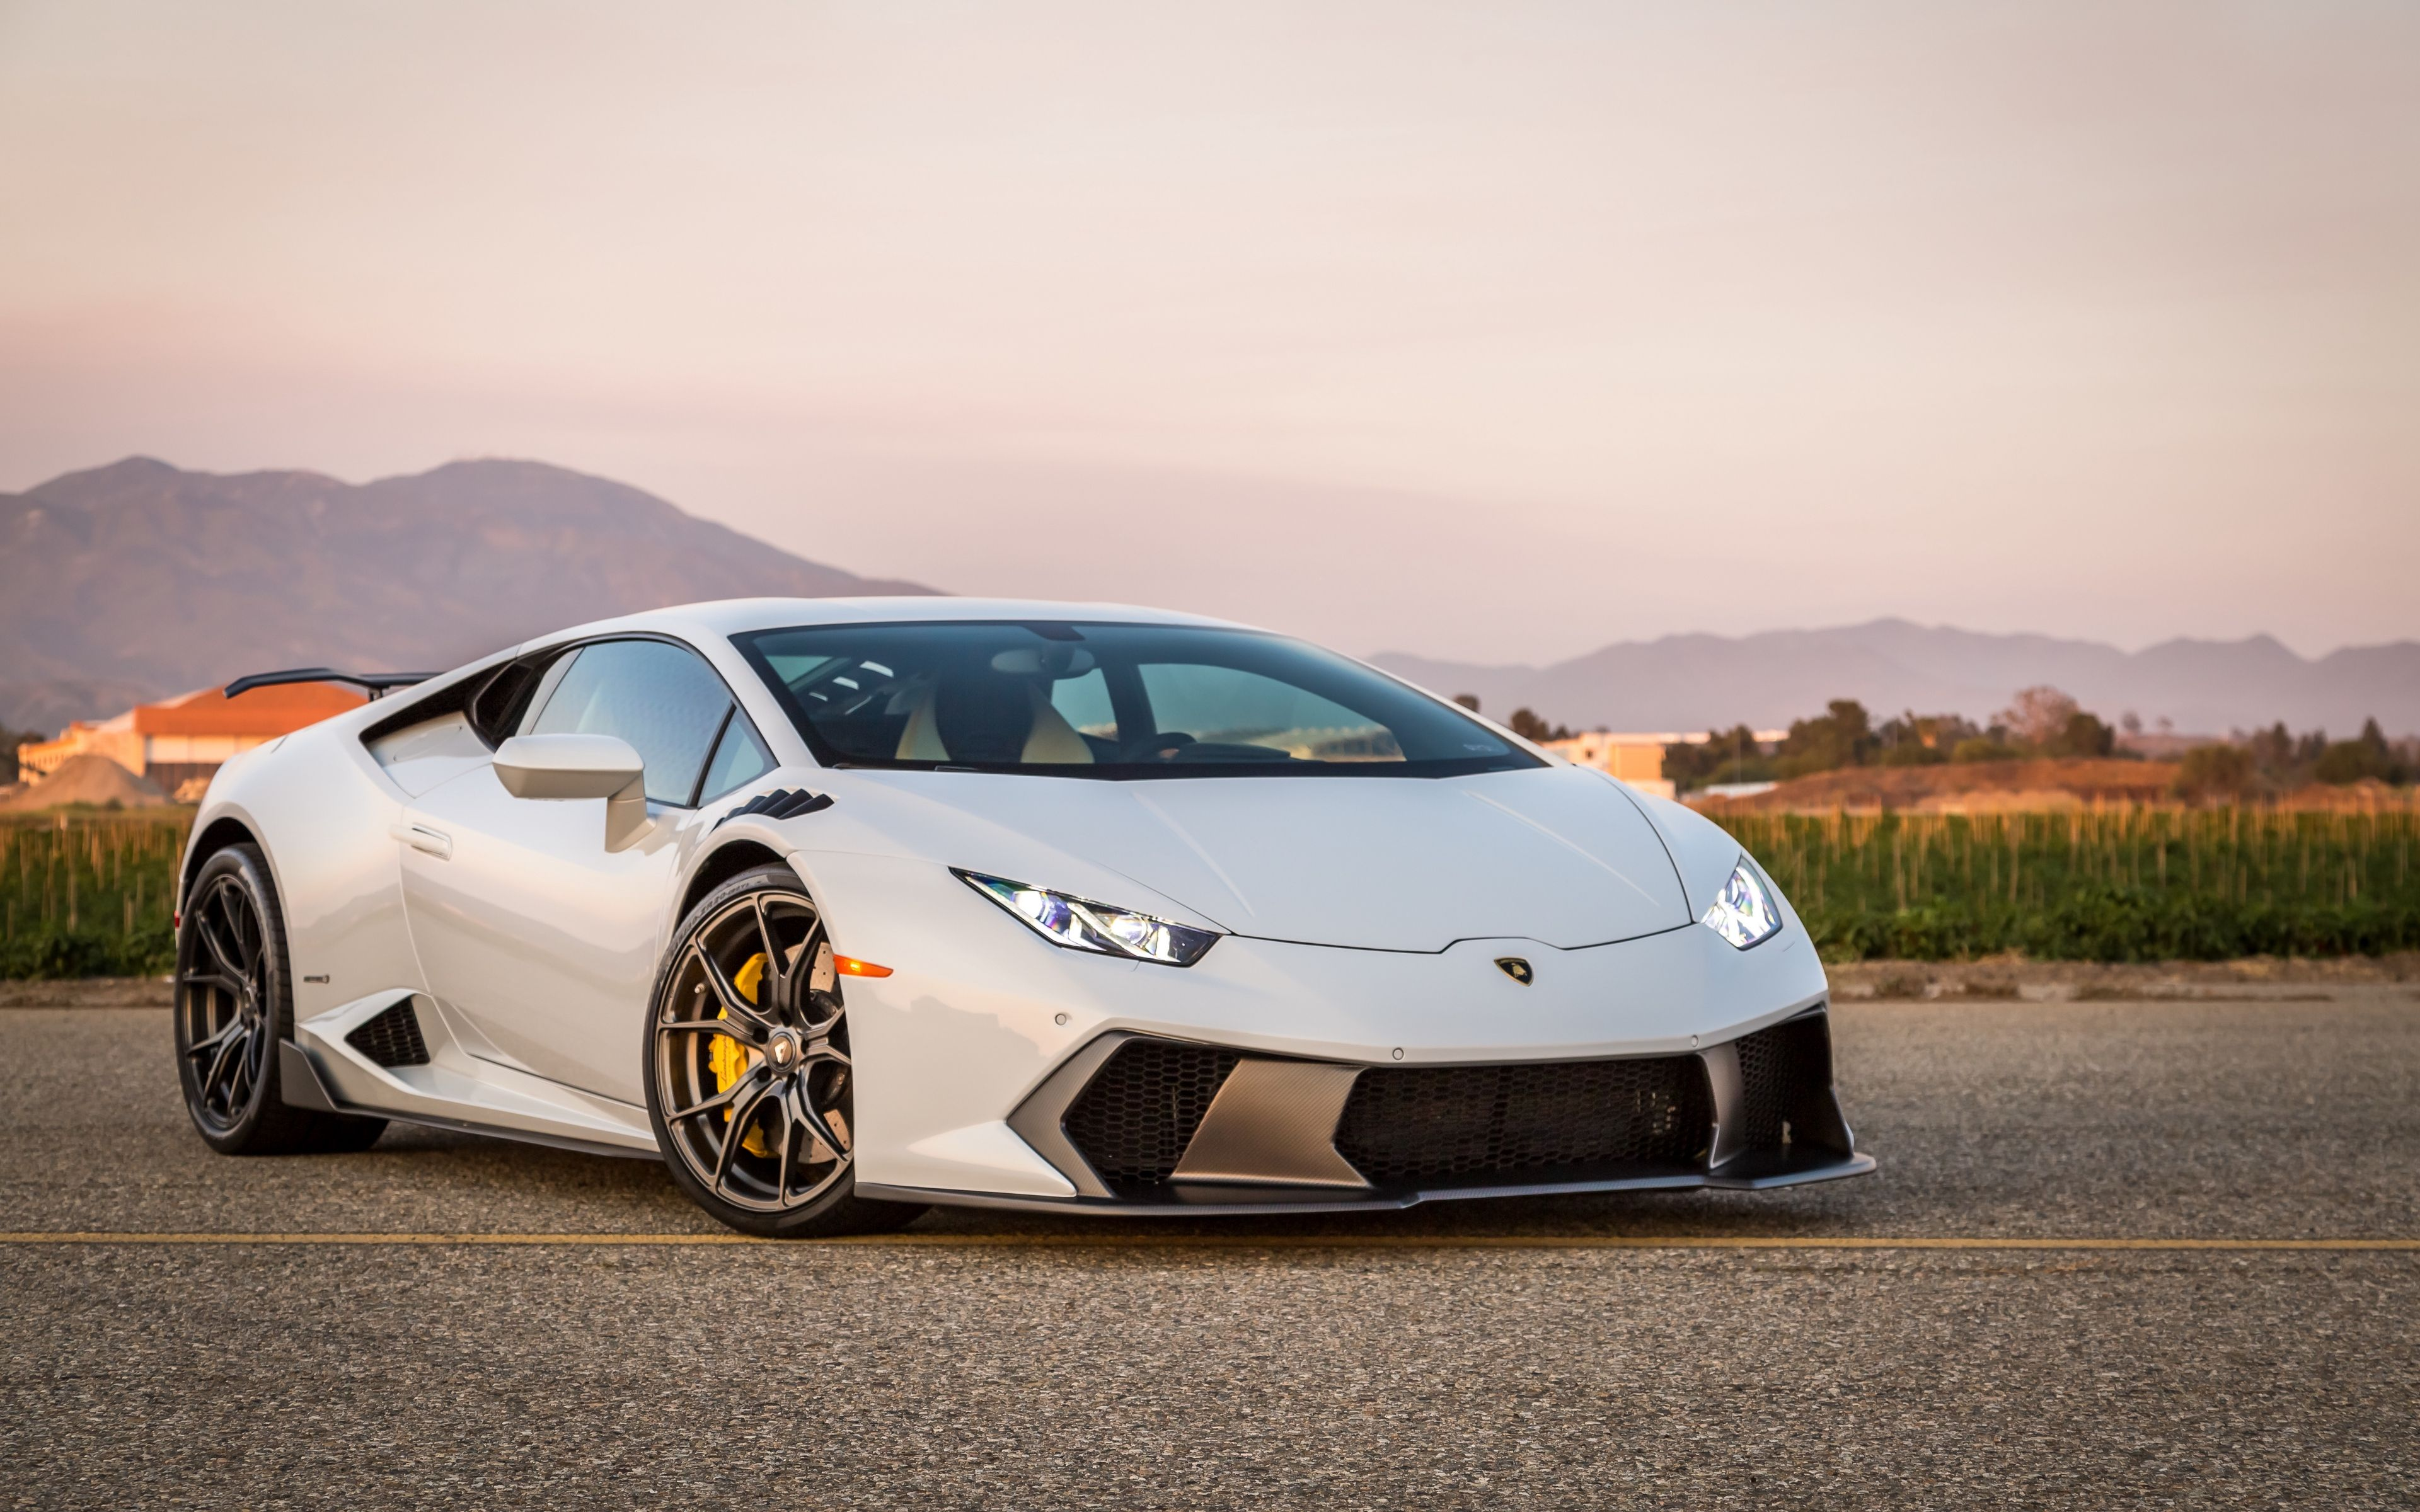 Lamborghini Huracan 4K Wallpapers , Top Free Lamborghini